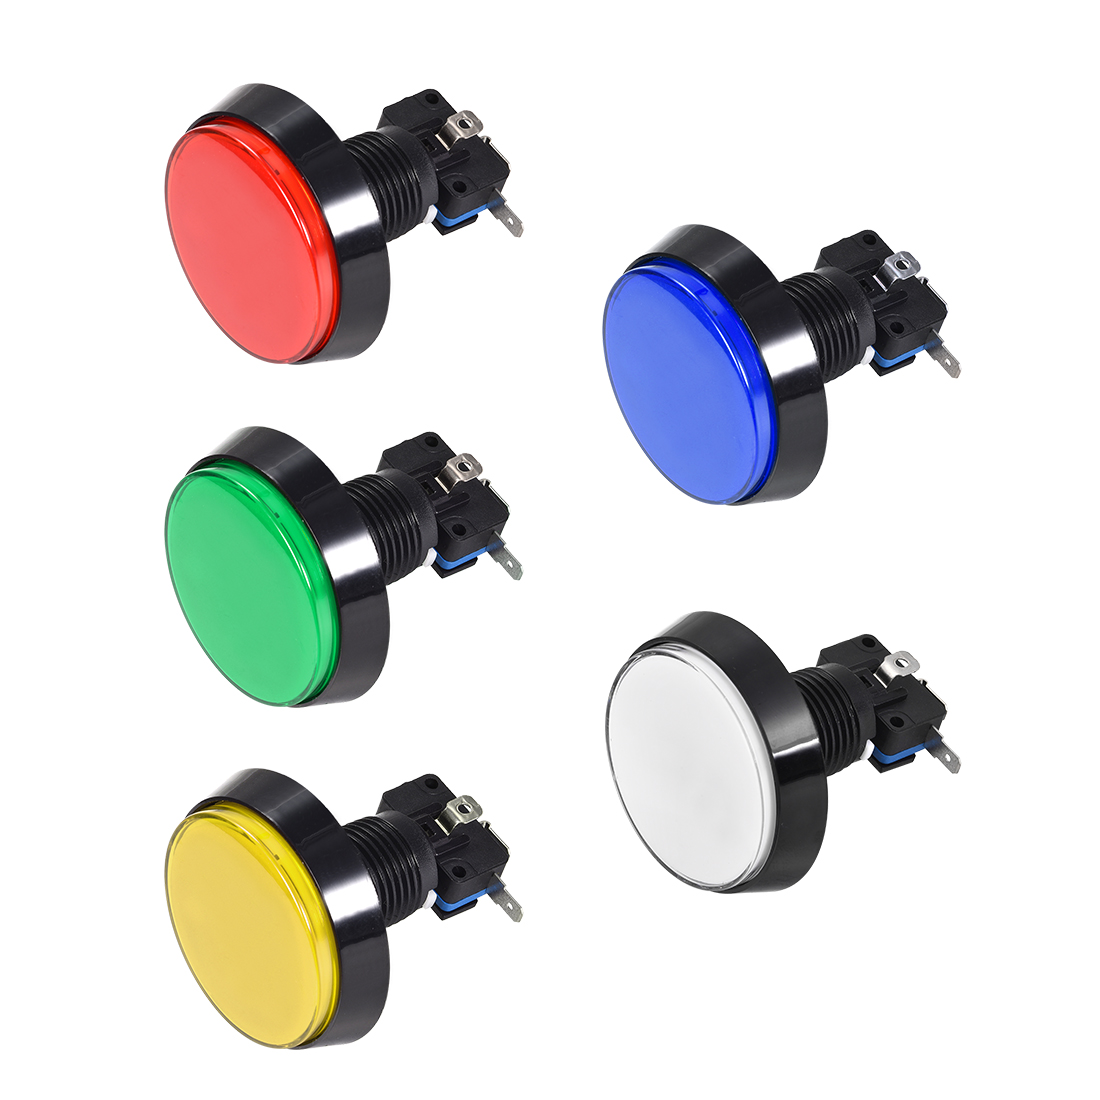 Game Push Button 60mm Round 12V LED Illuminated Push Button Switch 5pcs